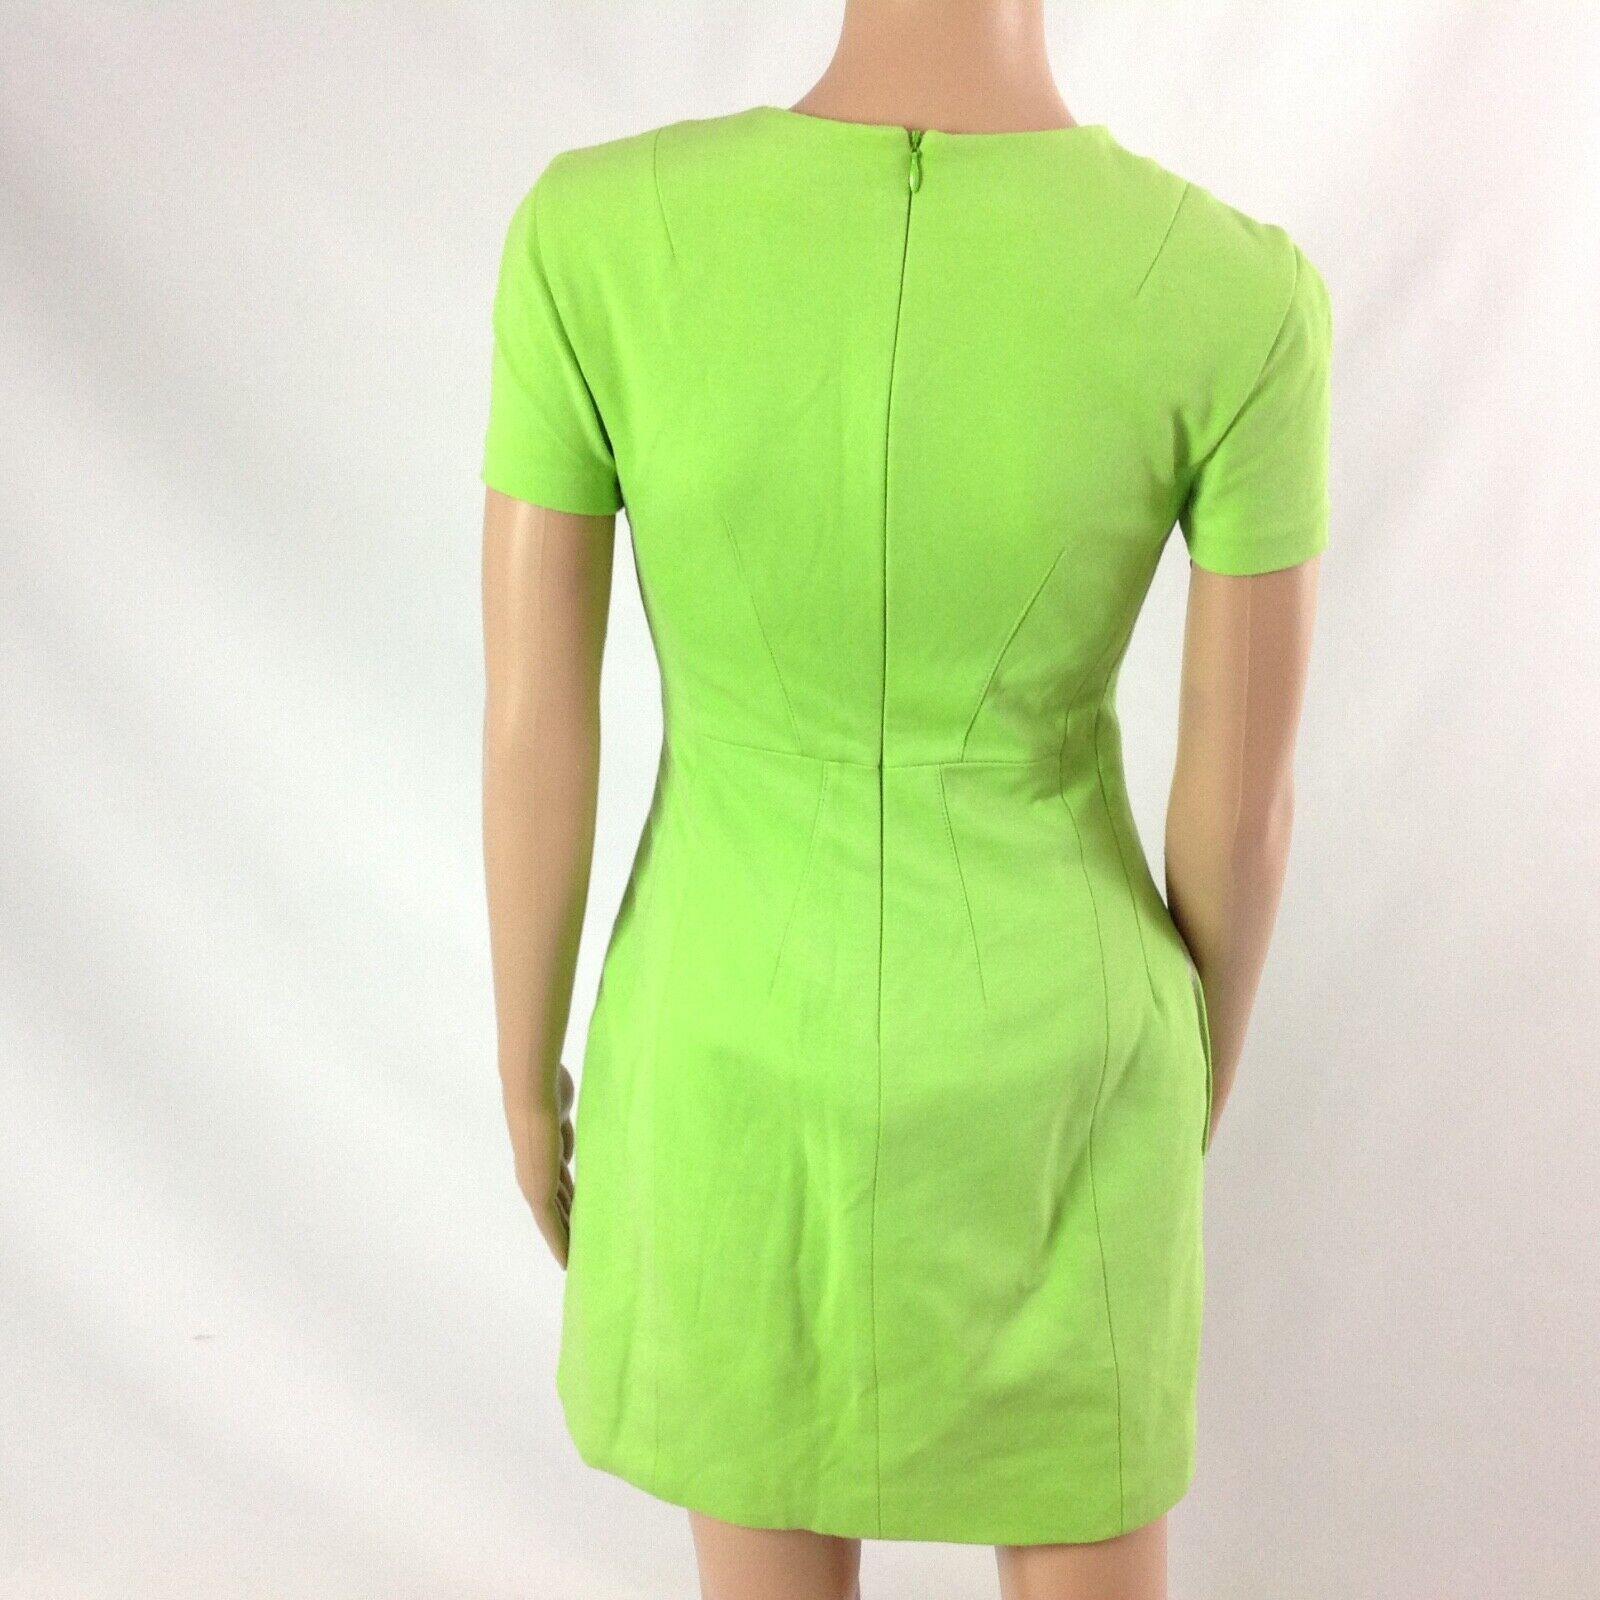 Diana von Furstenberg Agatha Knit Suiting Lime Gr… - image 7